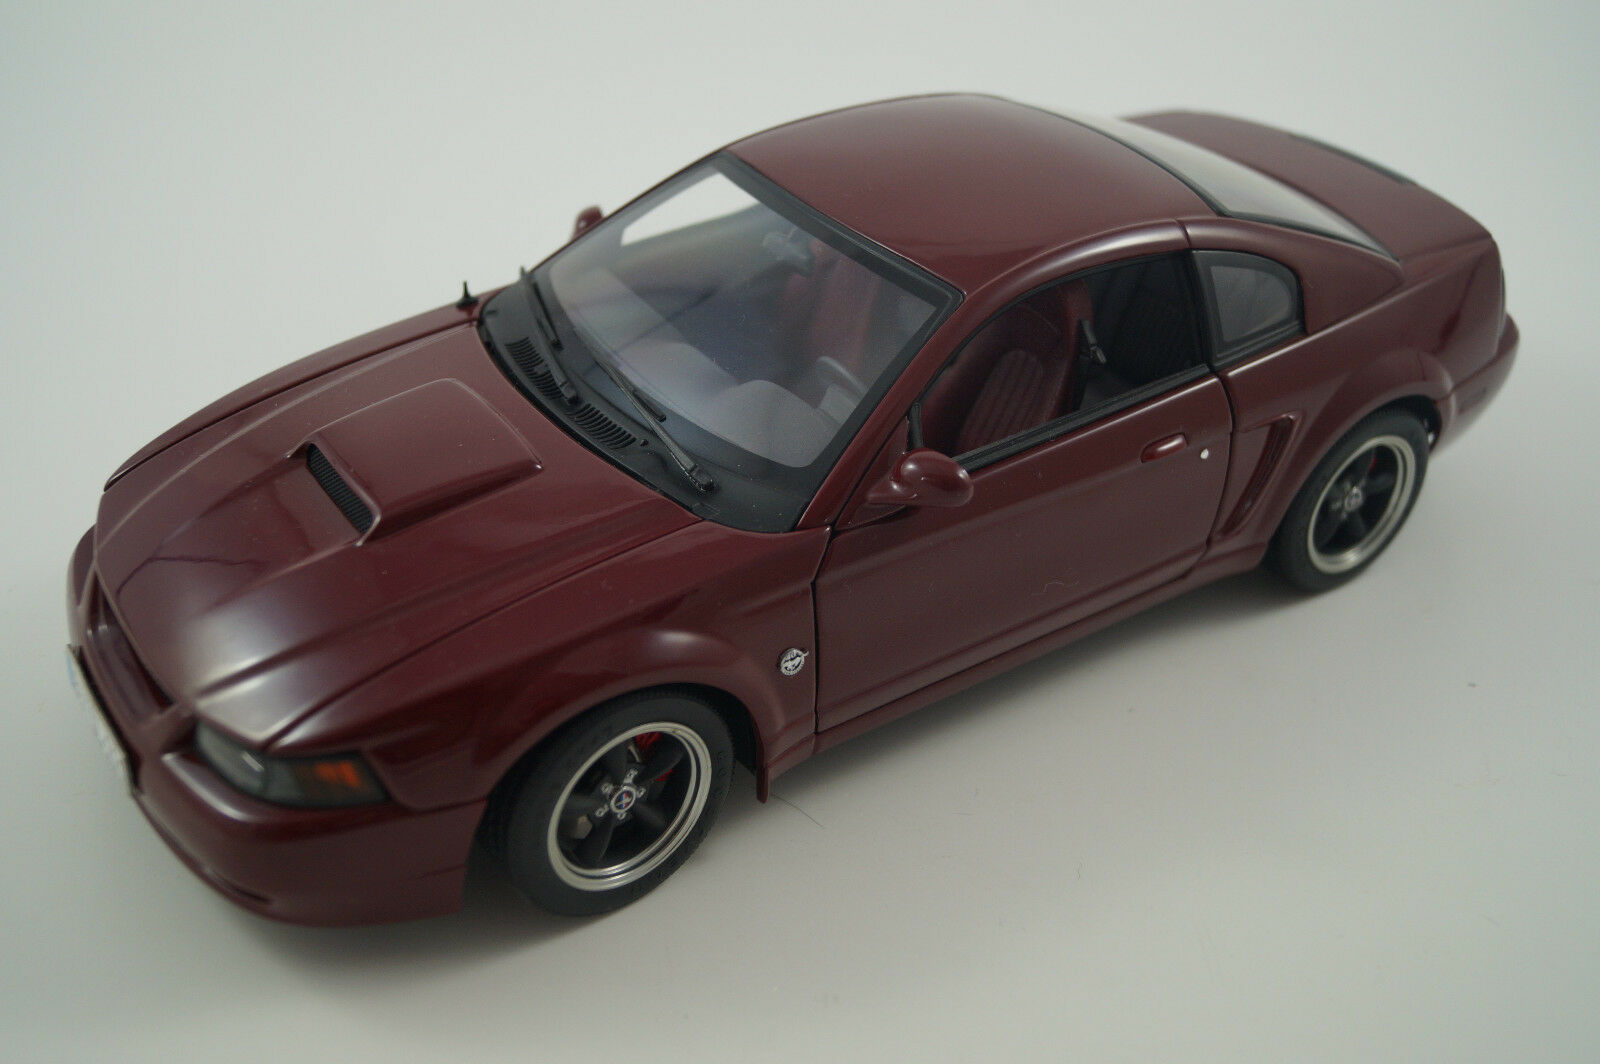 Autoart maqueta de coche 1 18 Ford Mustang GT 2003 Bullit